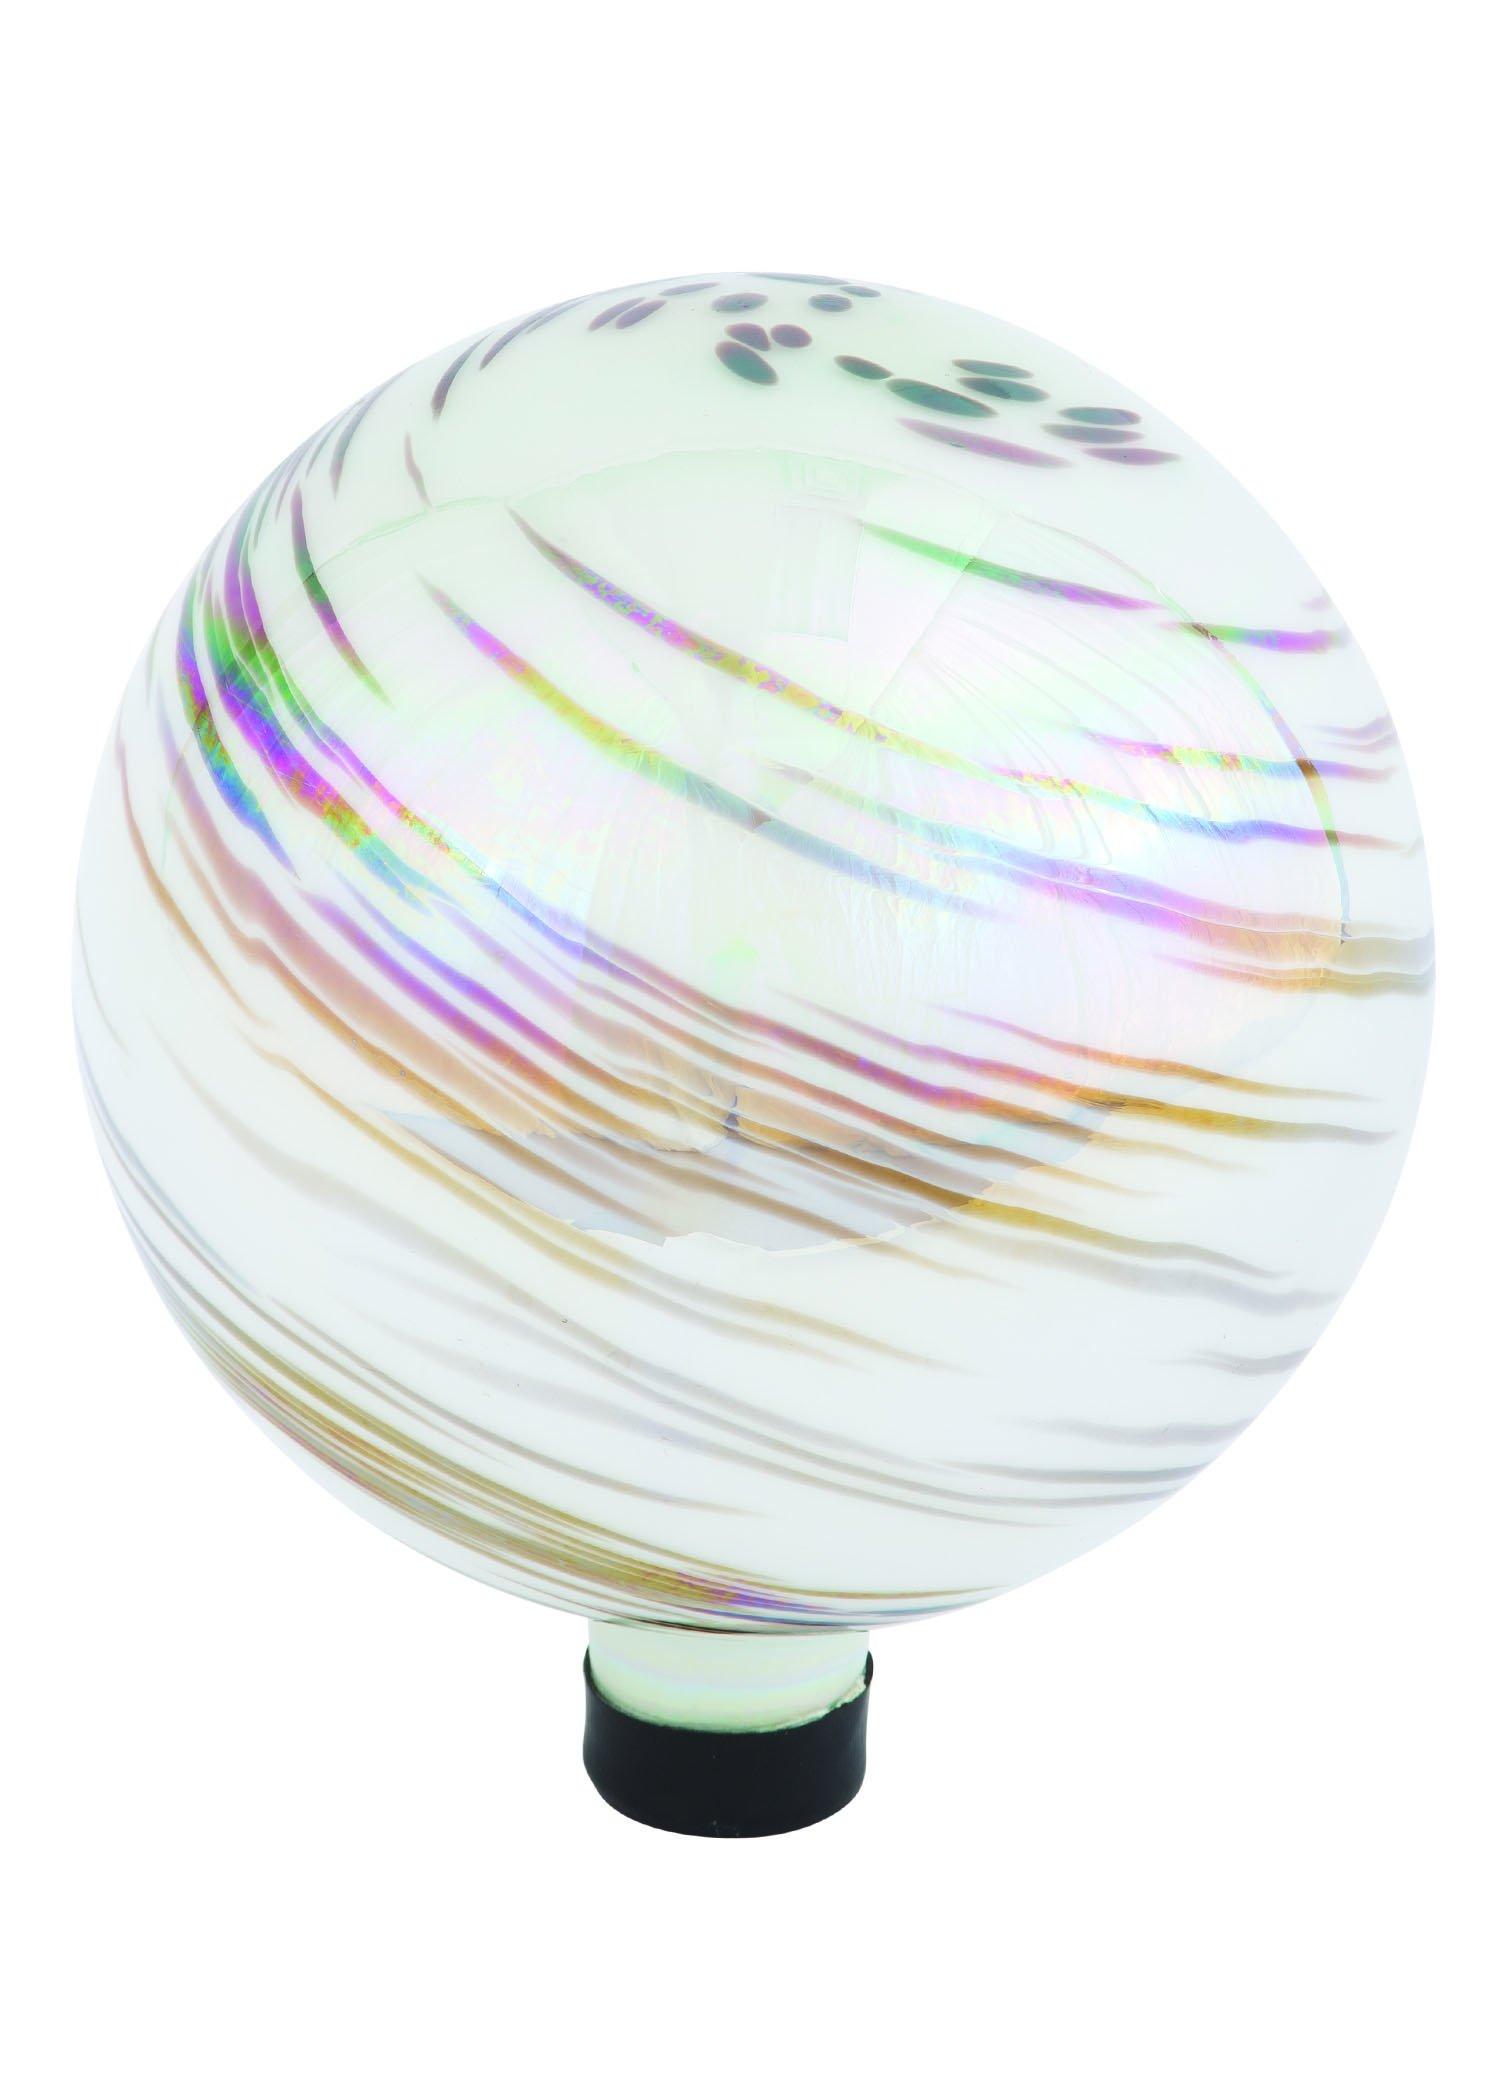 Russco III GD137203 Glass Gazing Ball, 10'', White Iridescent Swirl by Russco III